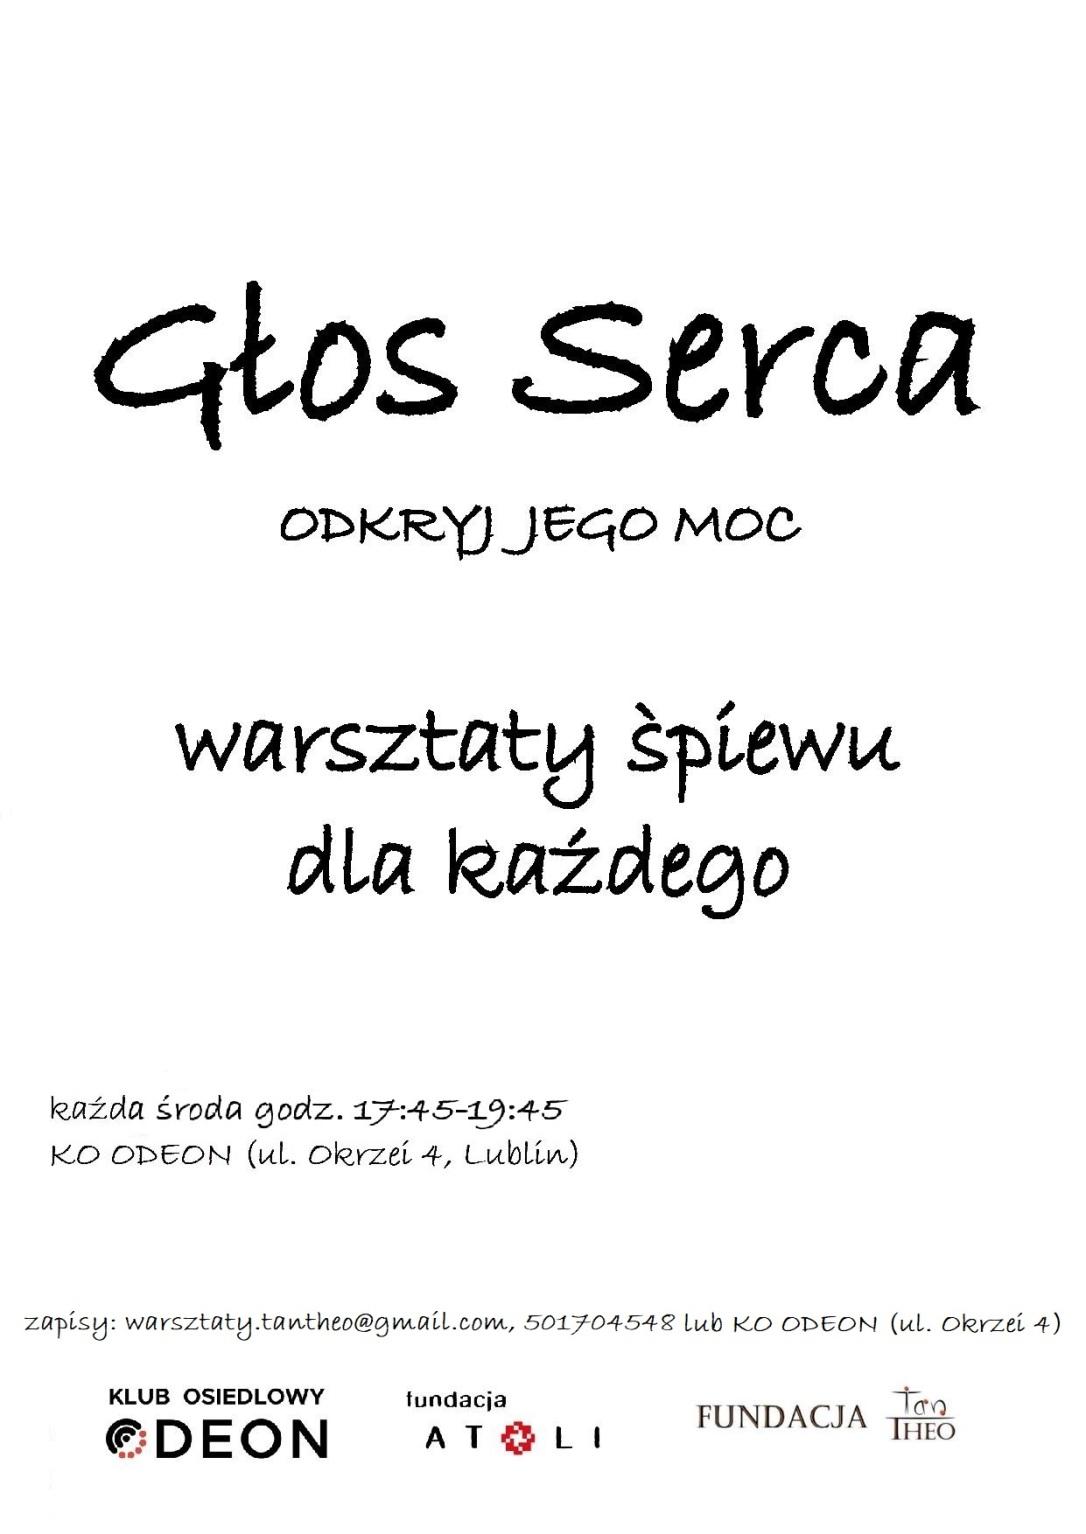 Głos Serca KO ODON new